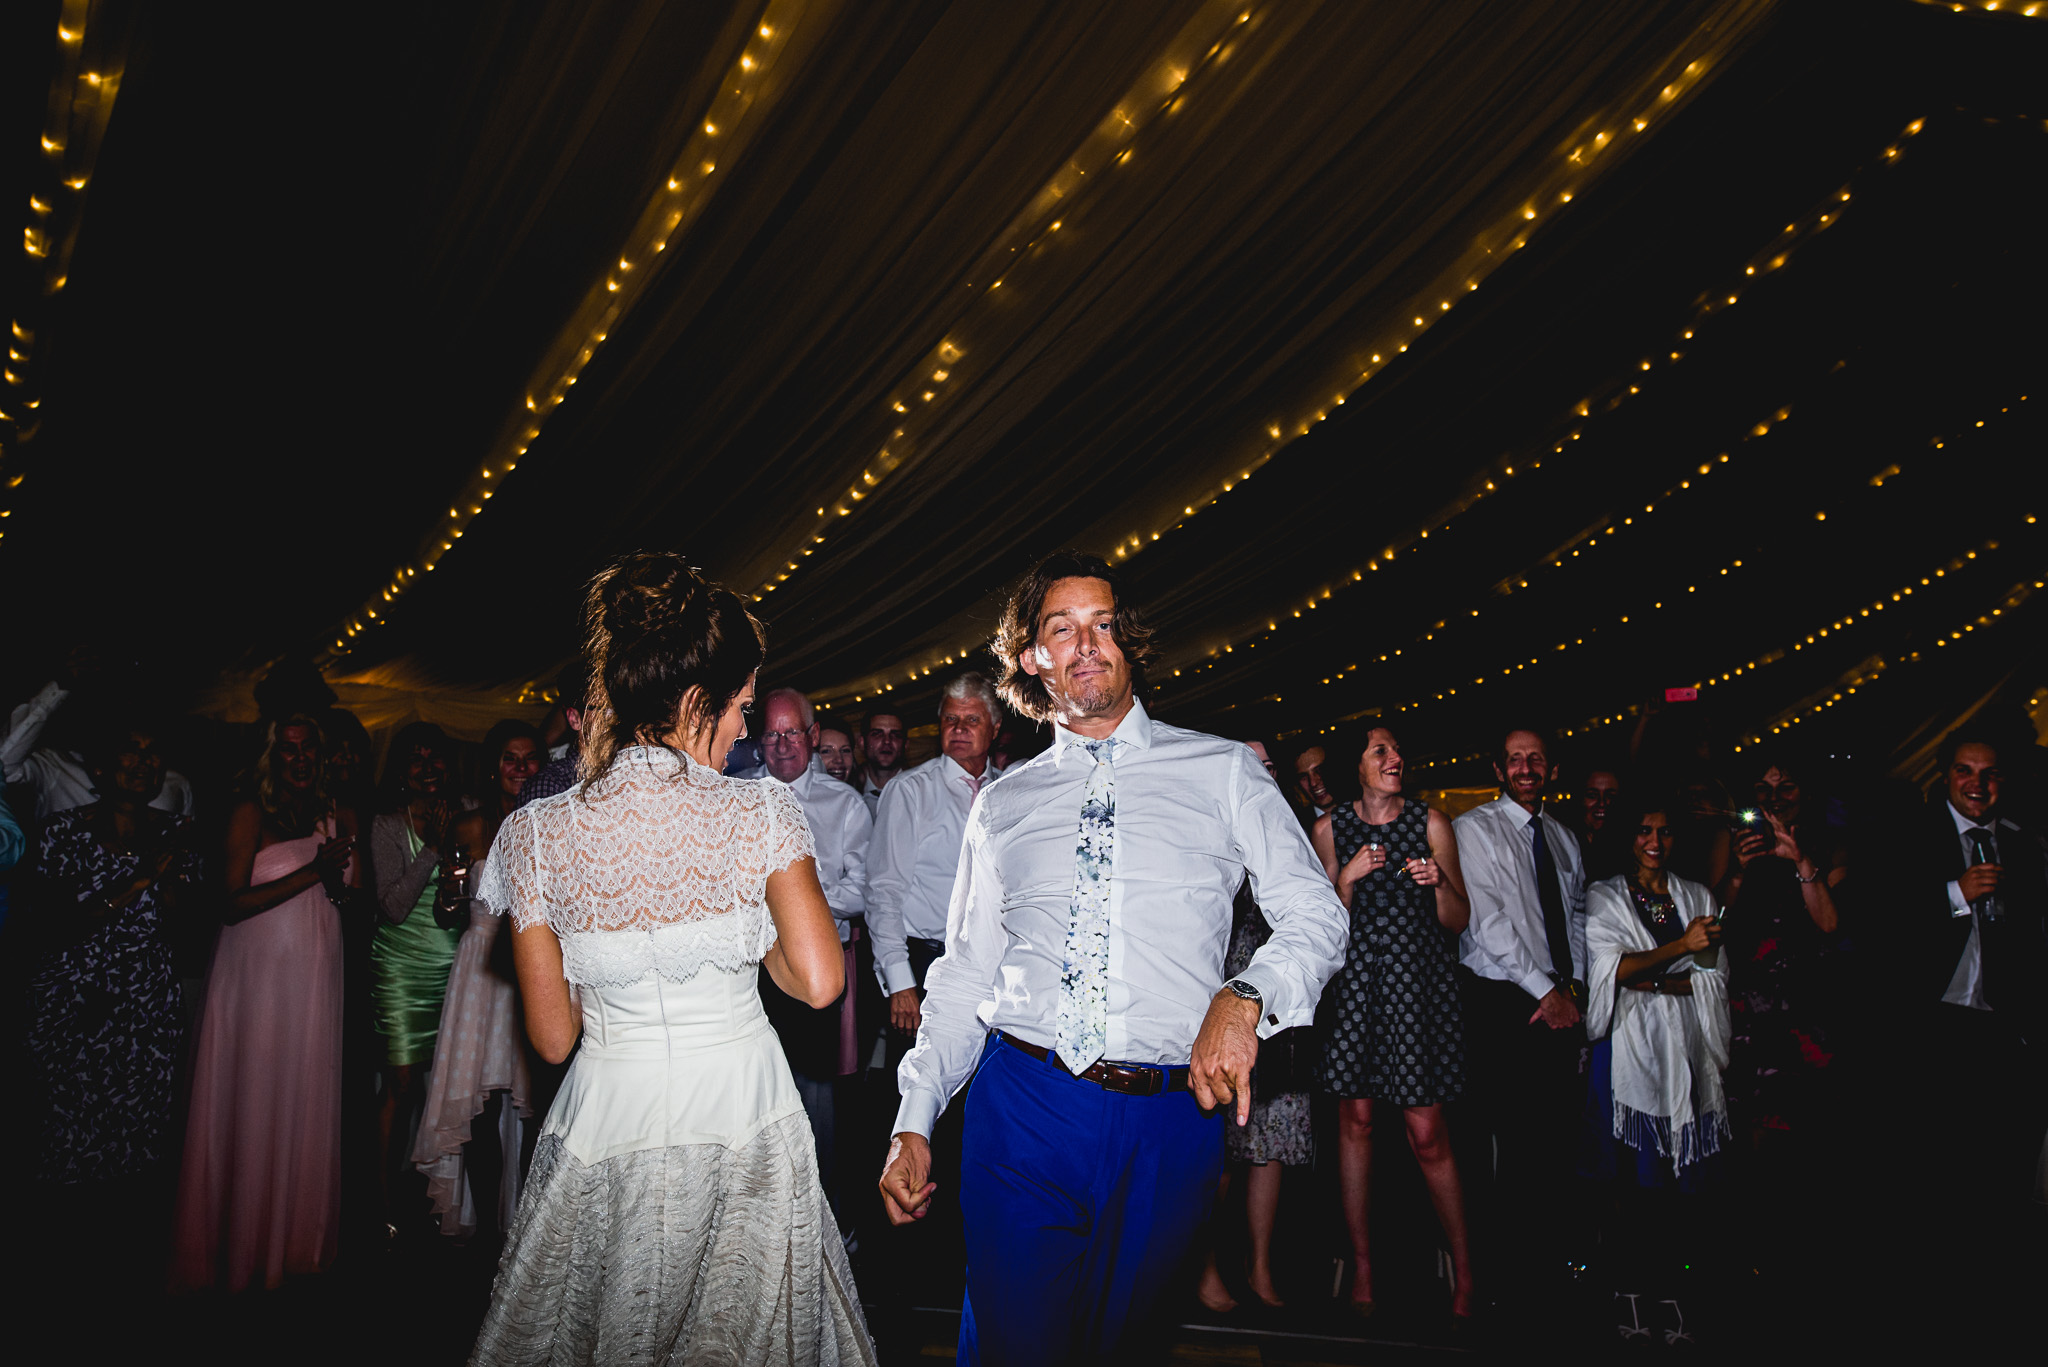 Lara & Jack Wedding 220815 by Barney Walters_1050_BW2_0992